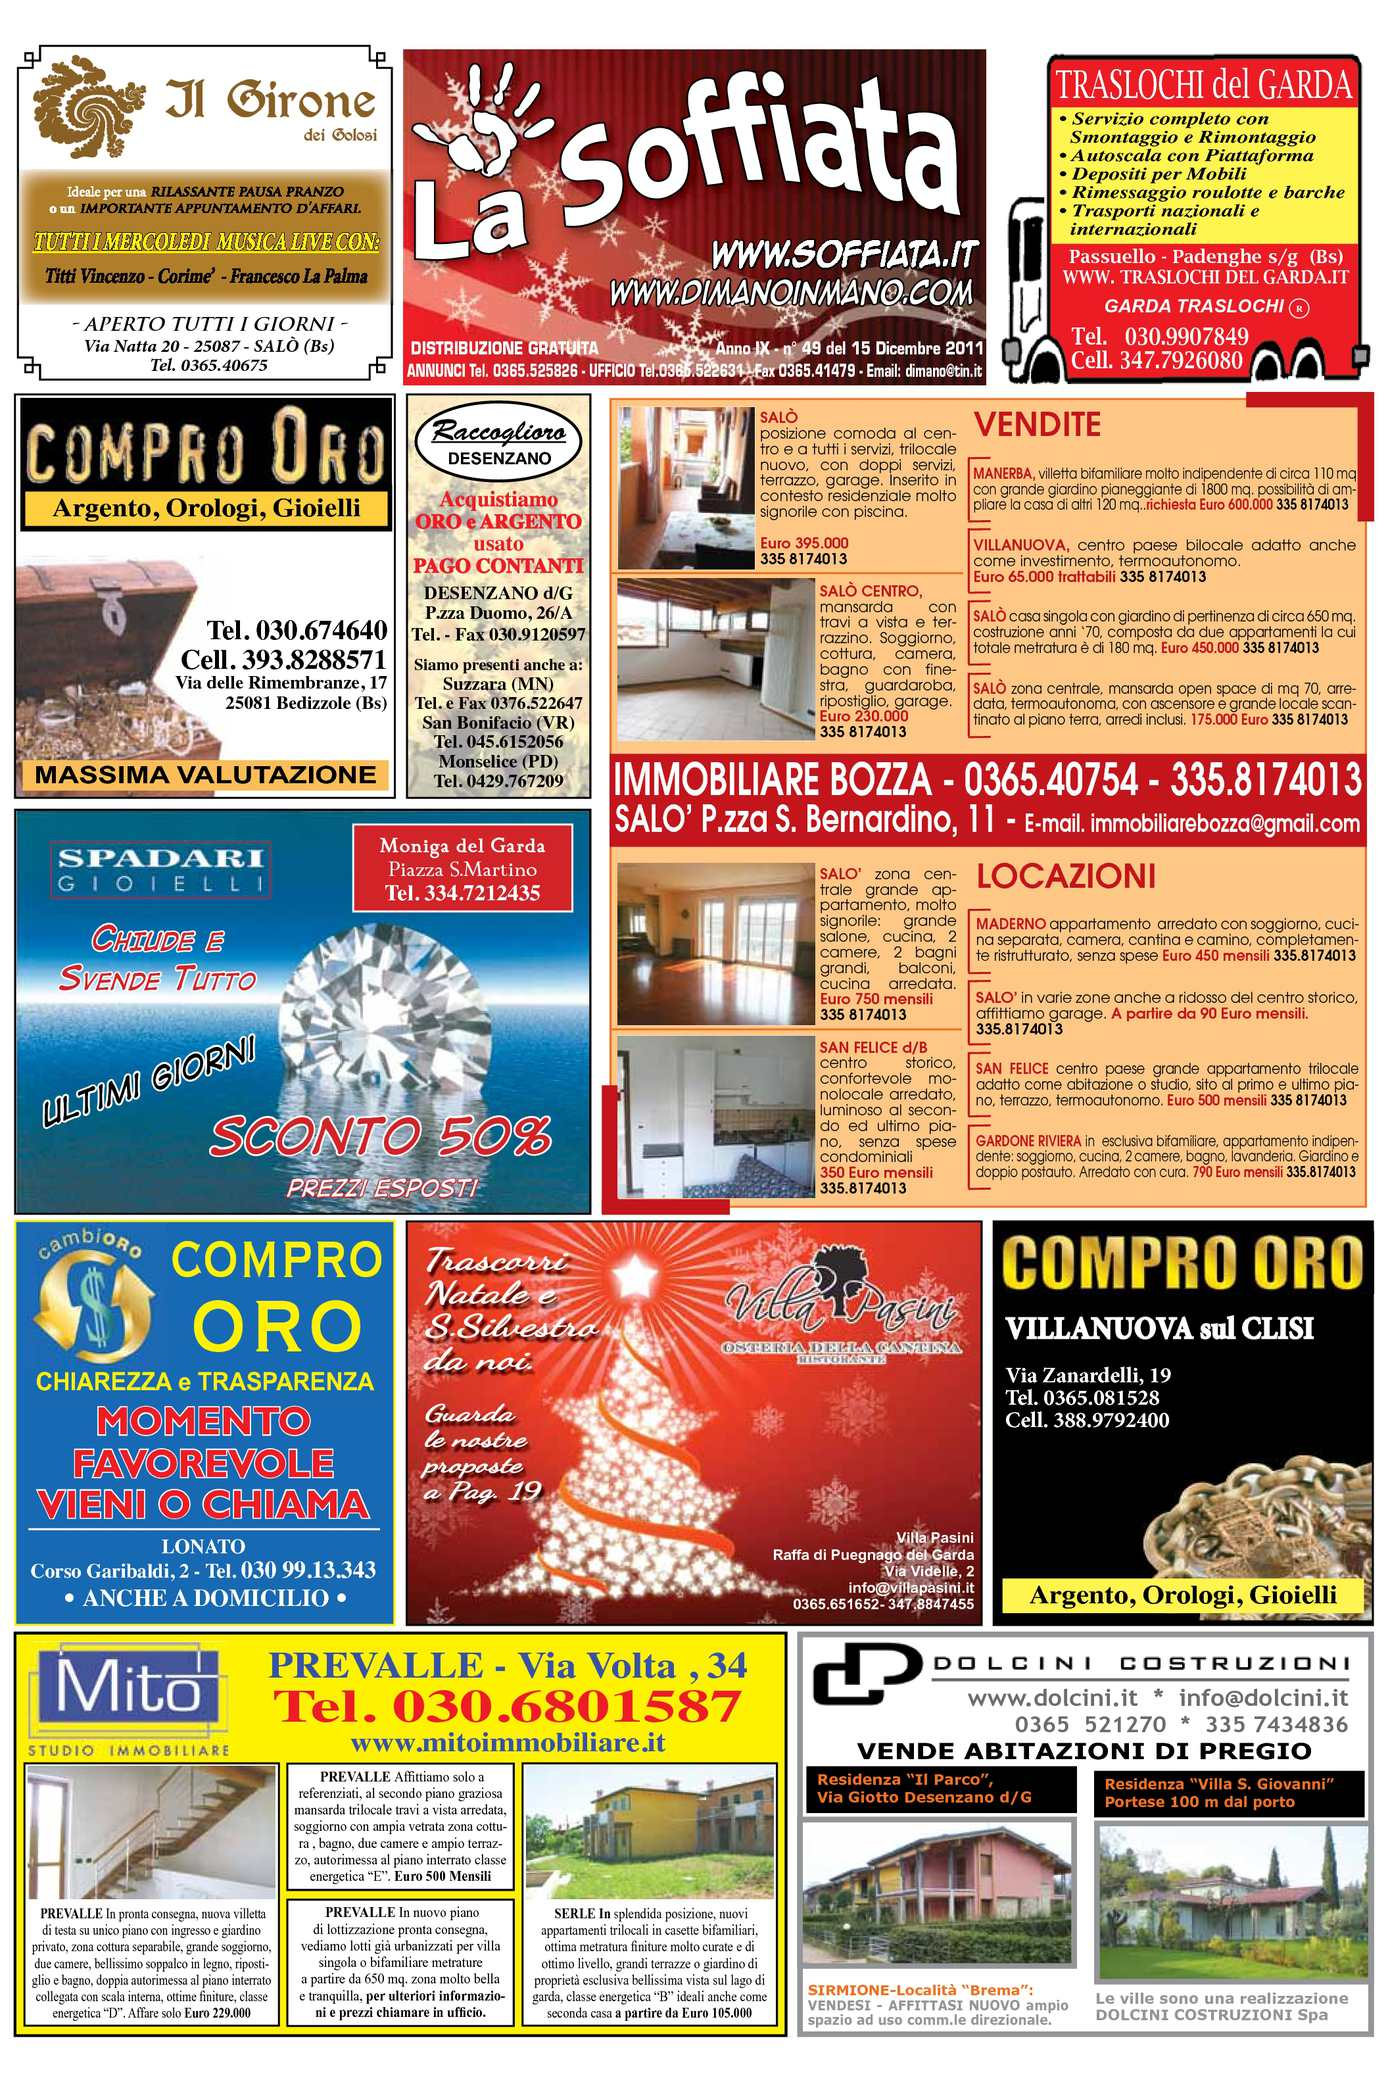 Calaméo - La Soffiata 15 12 2011 01b5bbae5f29